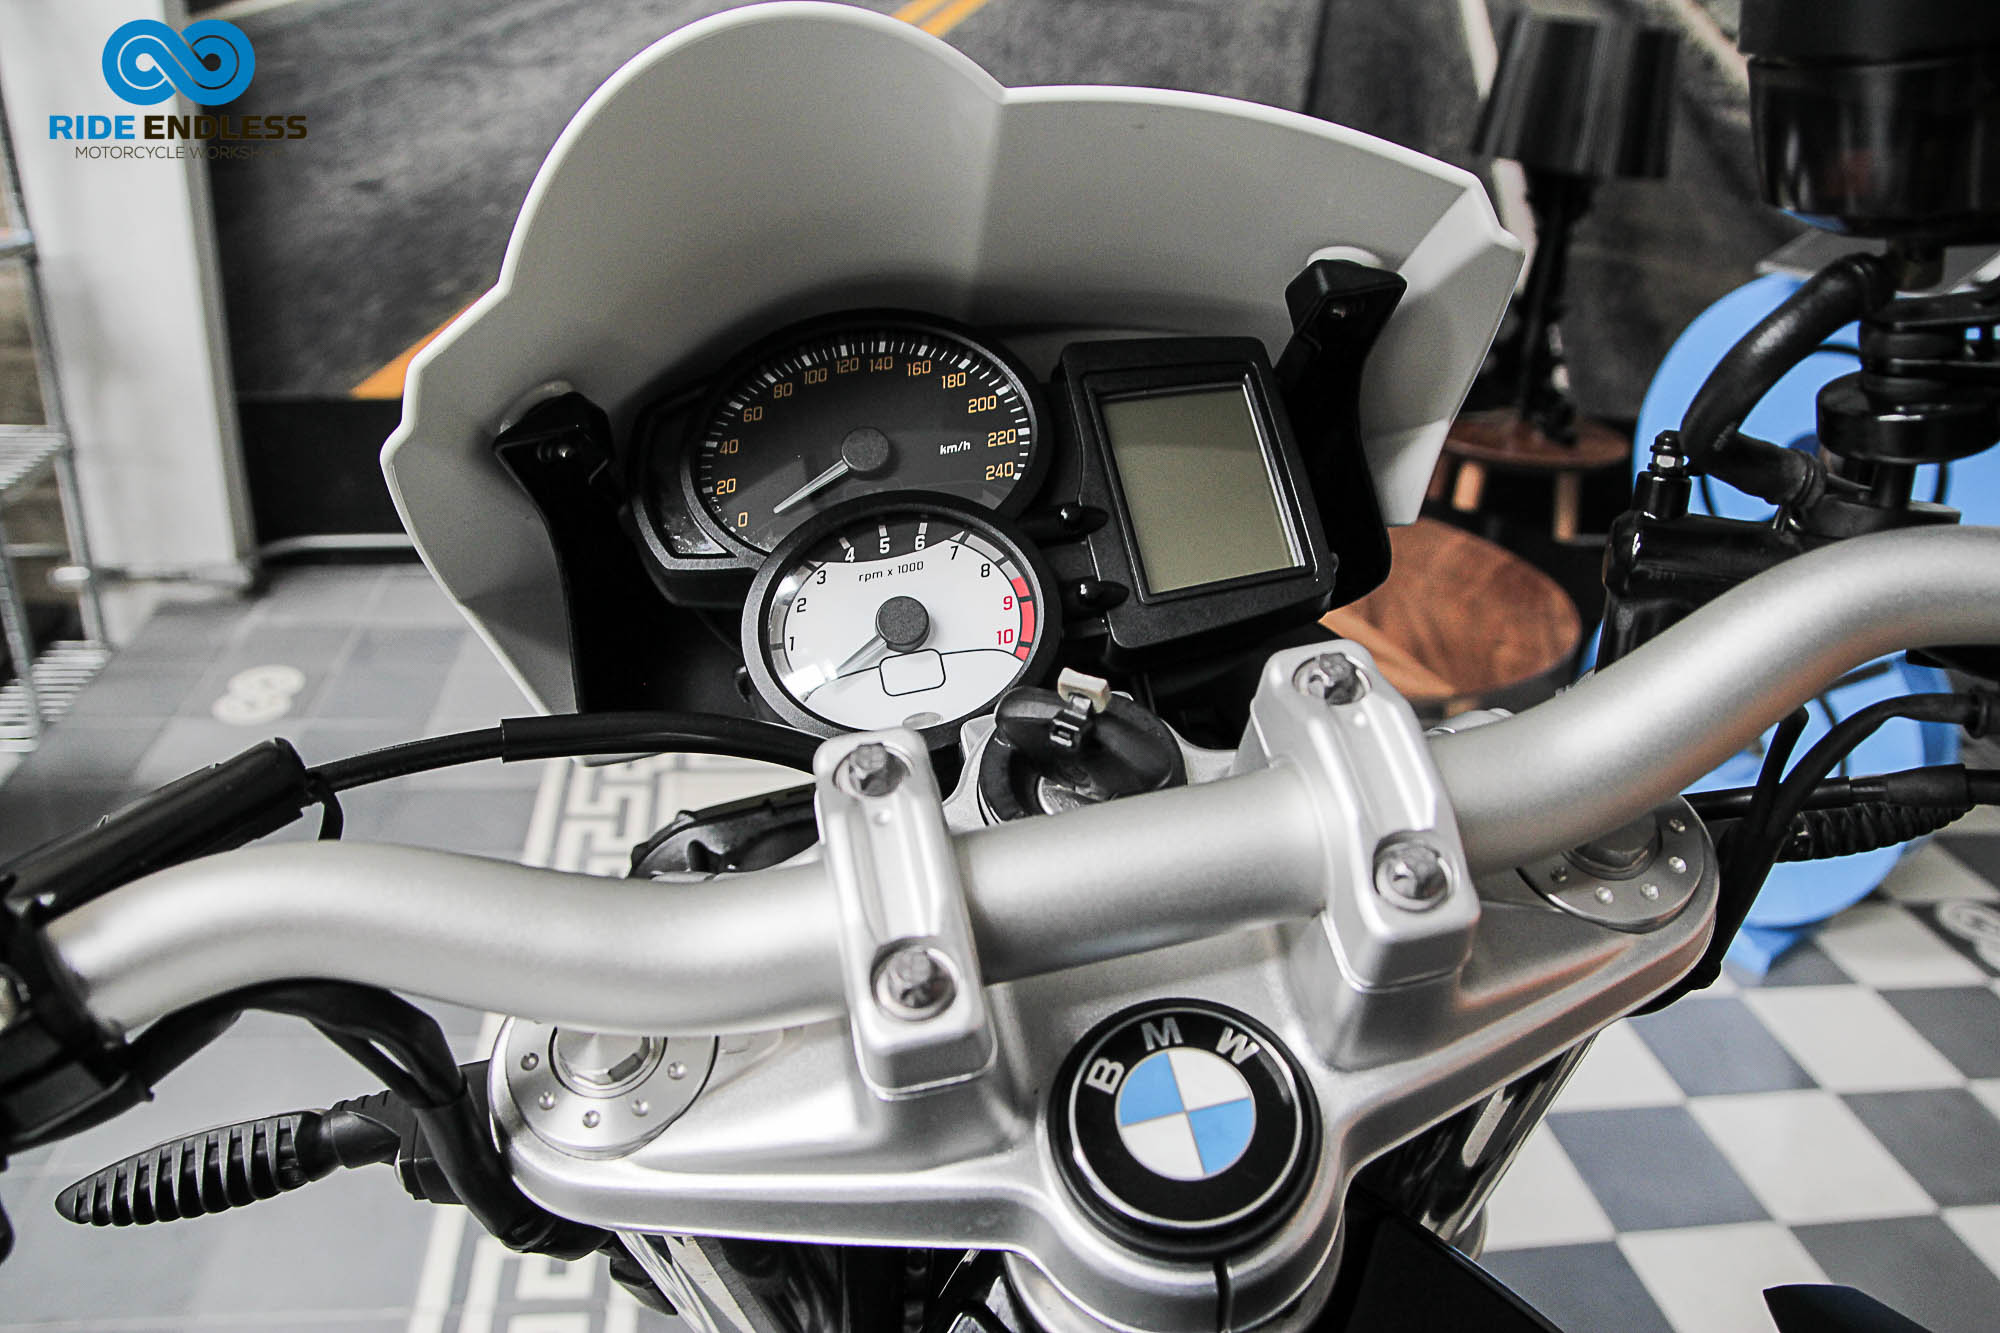 BMW F 800 R MODELO 2011